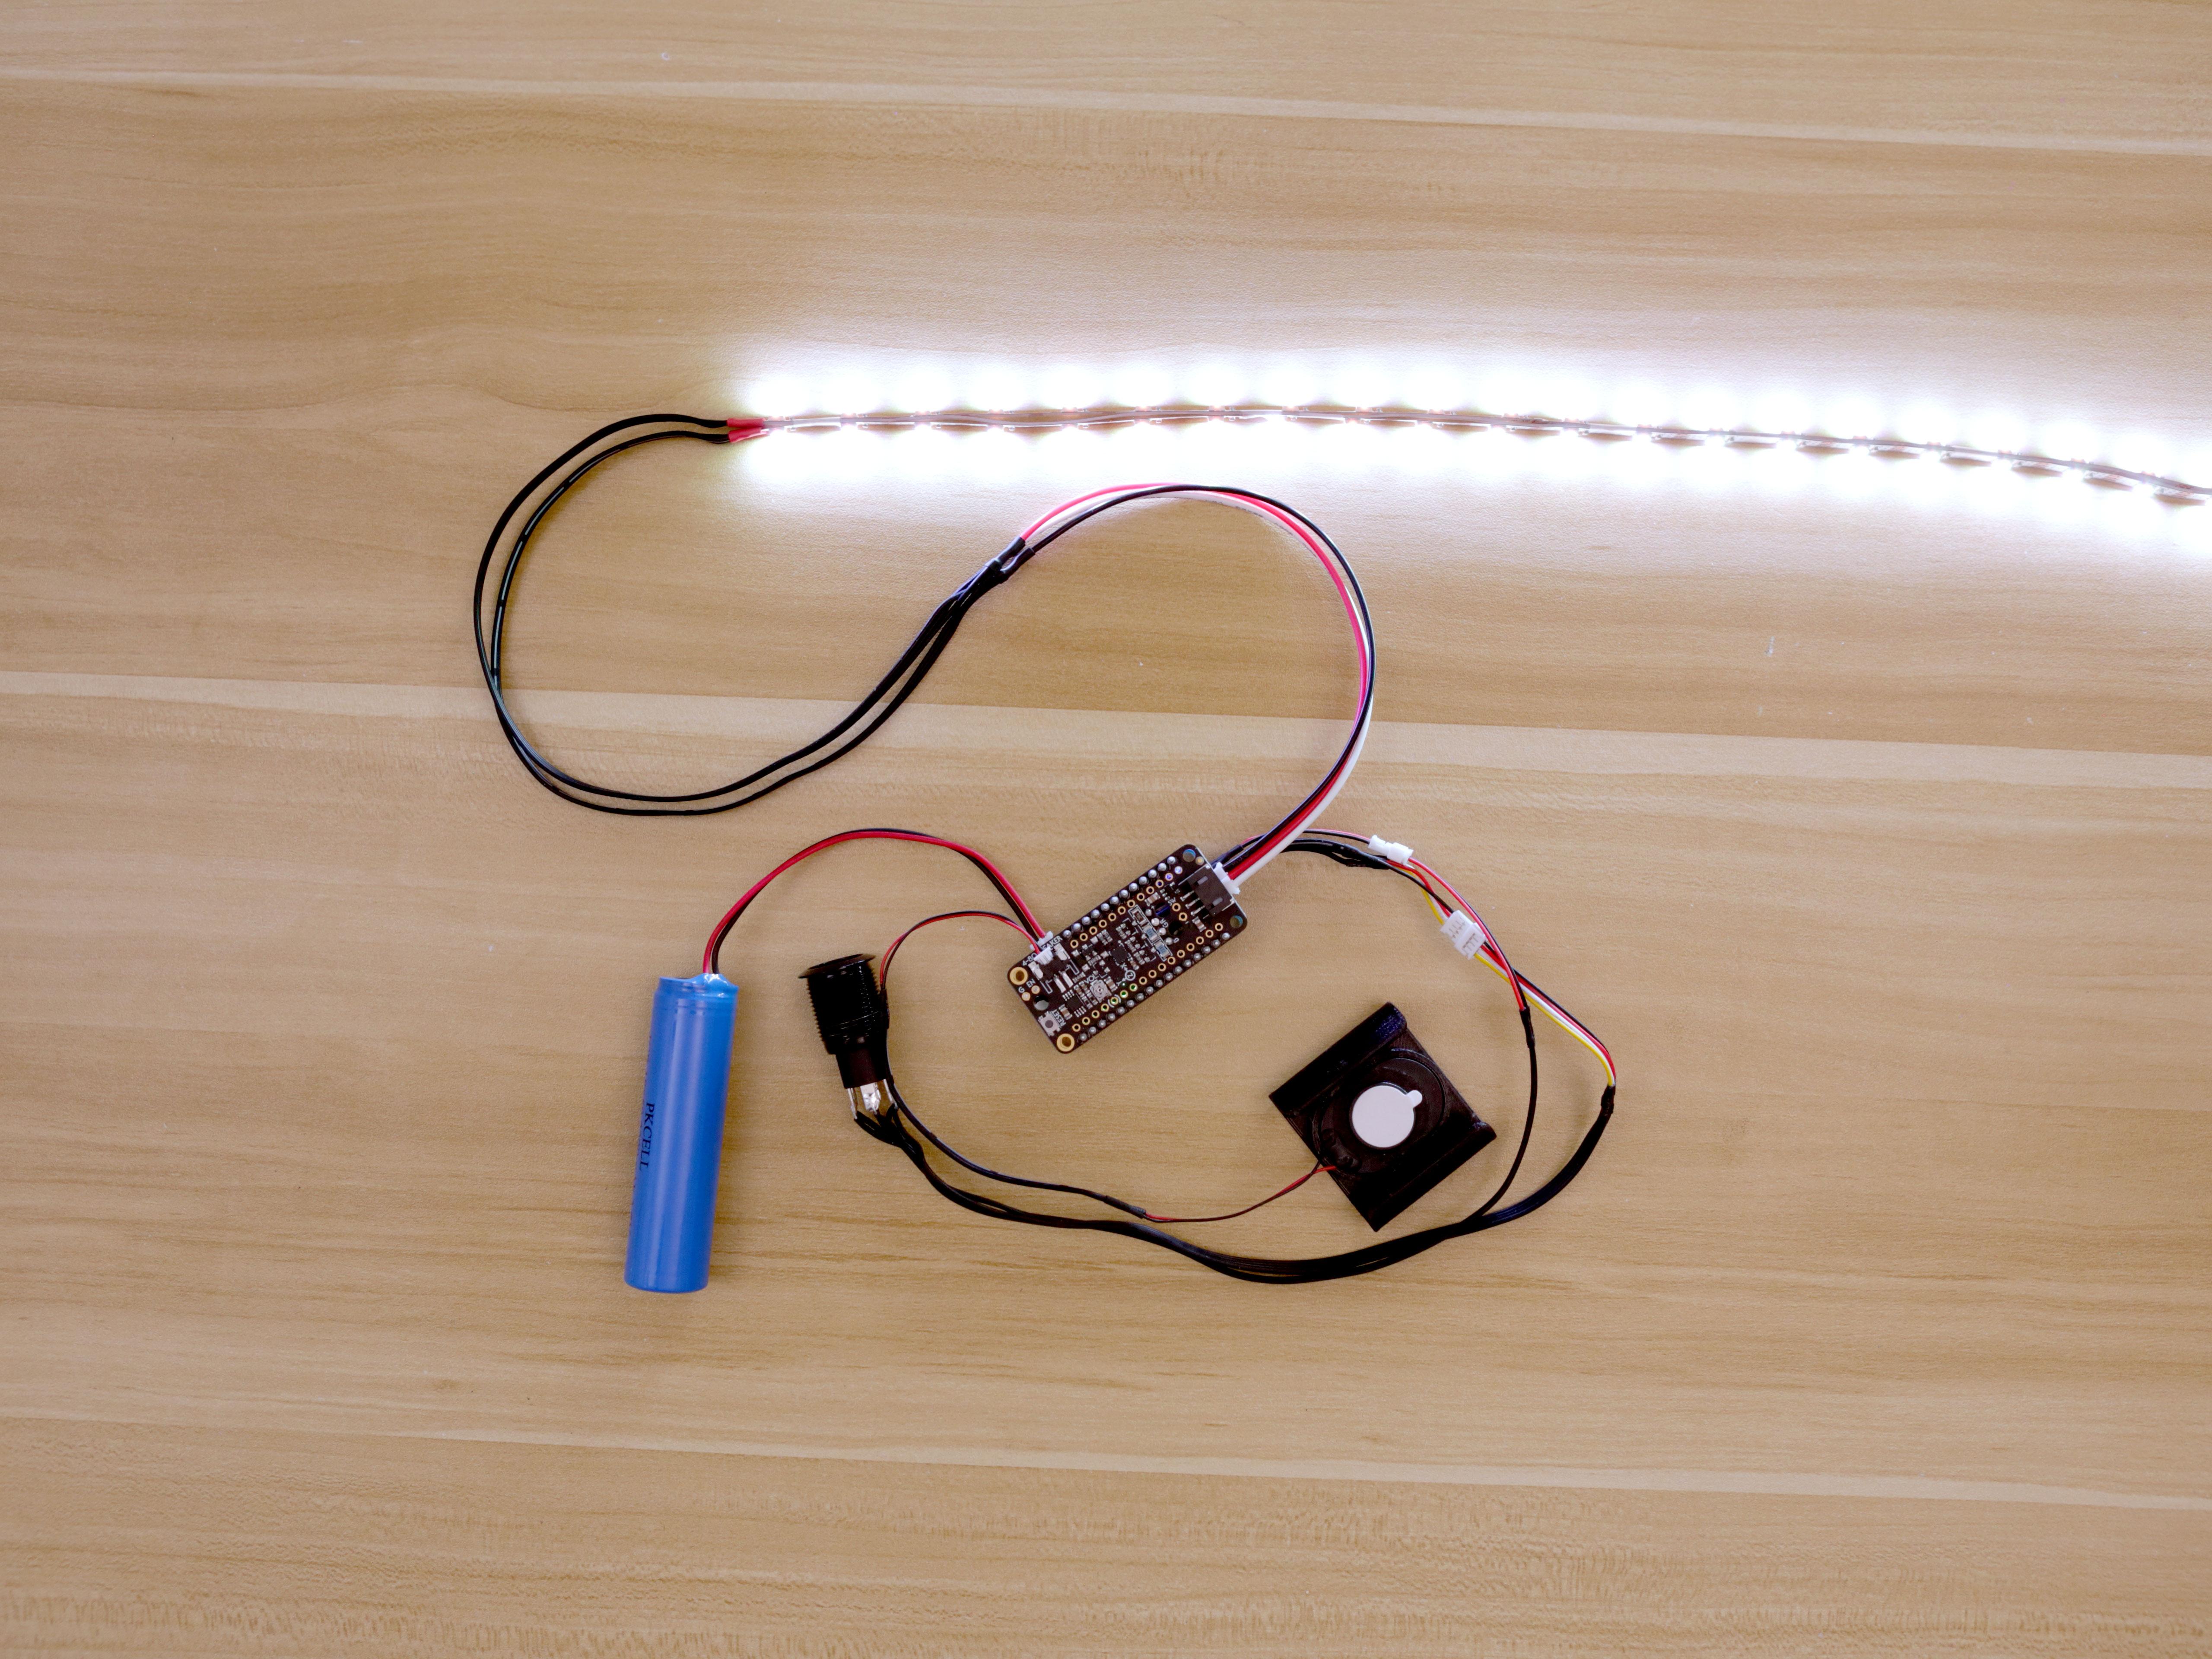 3d_printing_test-strip-circuit.jpg